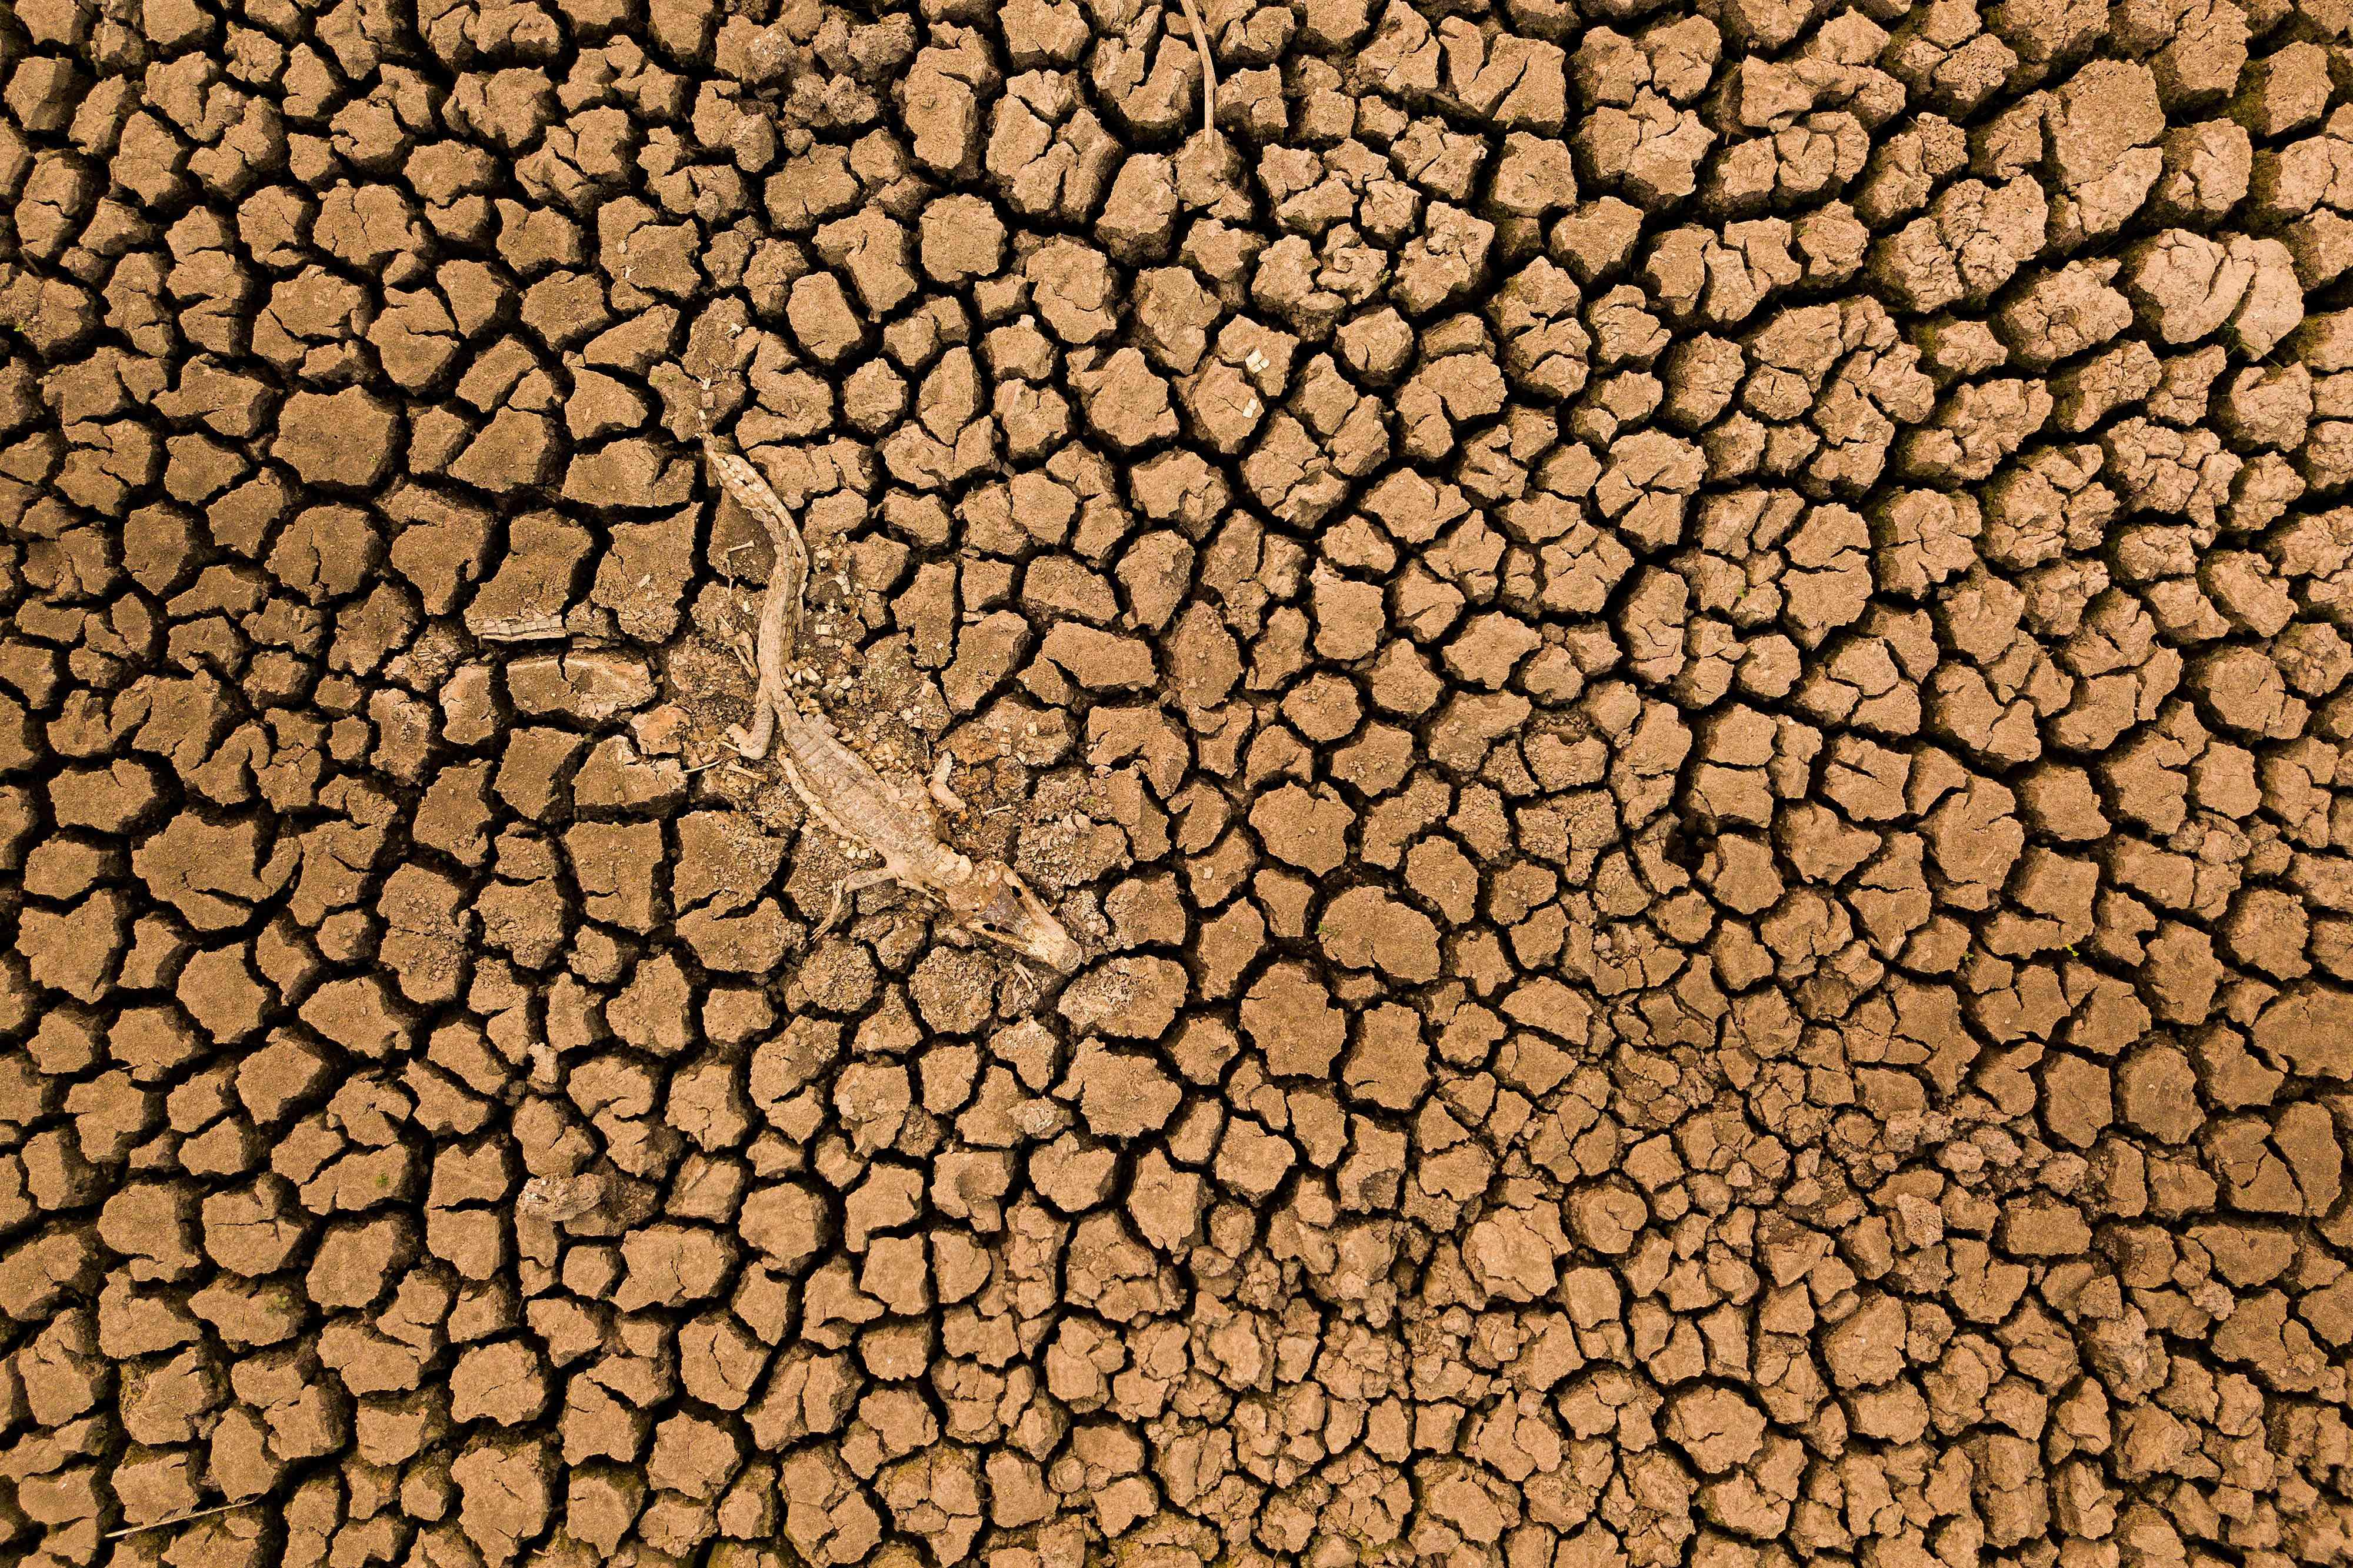 alligator carcass on dry soil